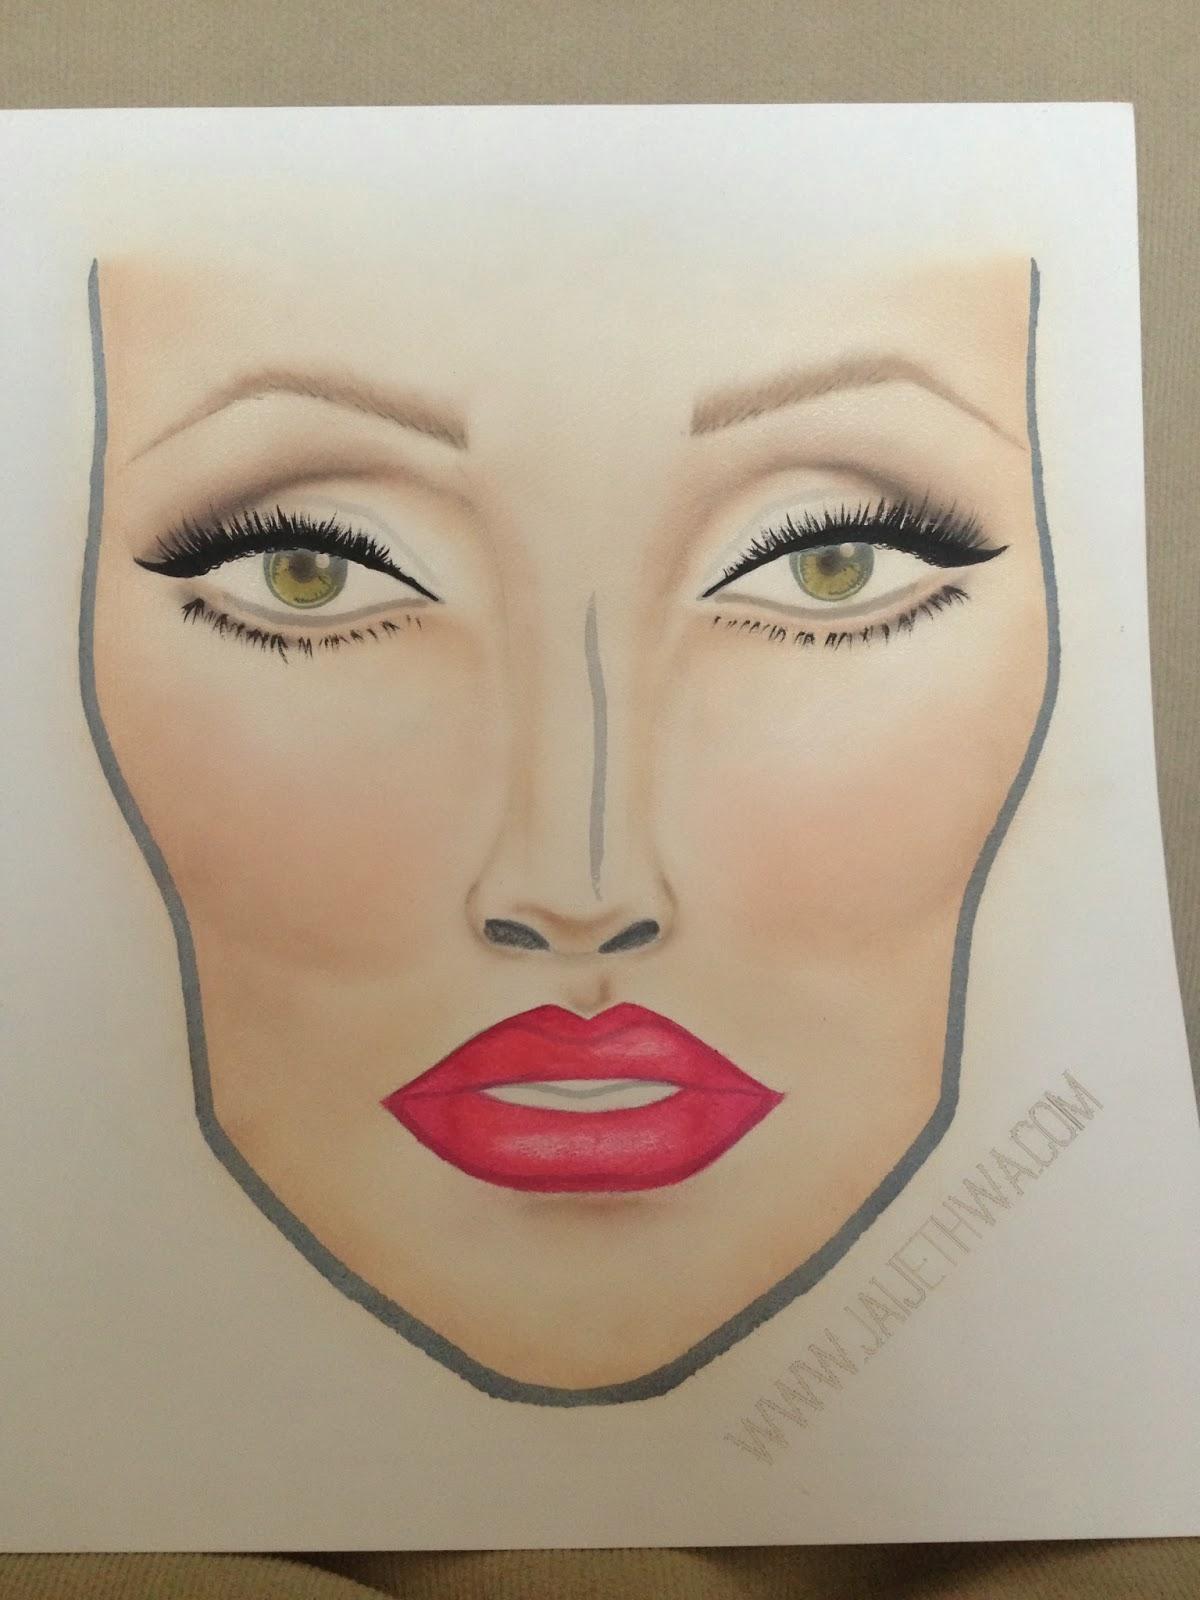 Makeup Artist essay quick